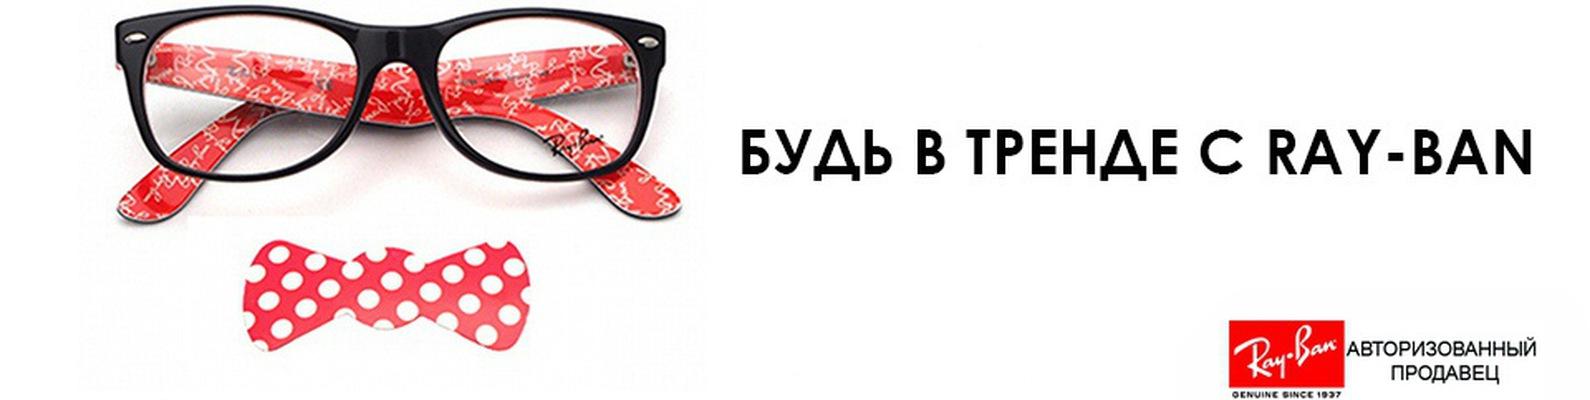 Ray Ban - солнцезащитные очки в Москве  c93cd4c698e74